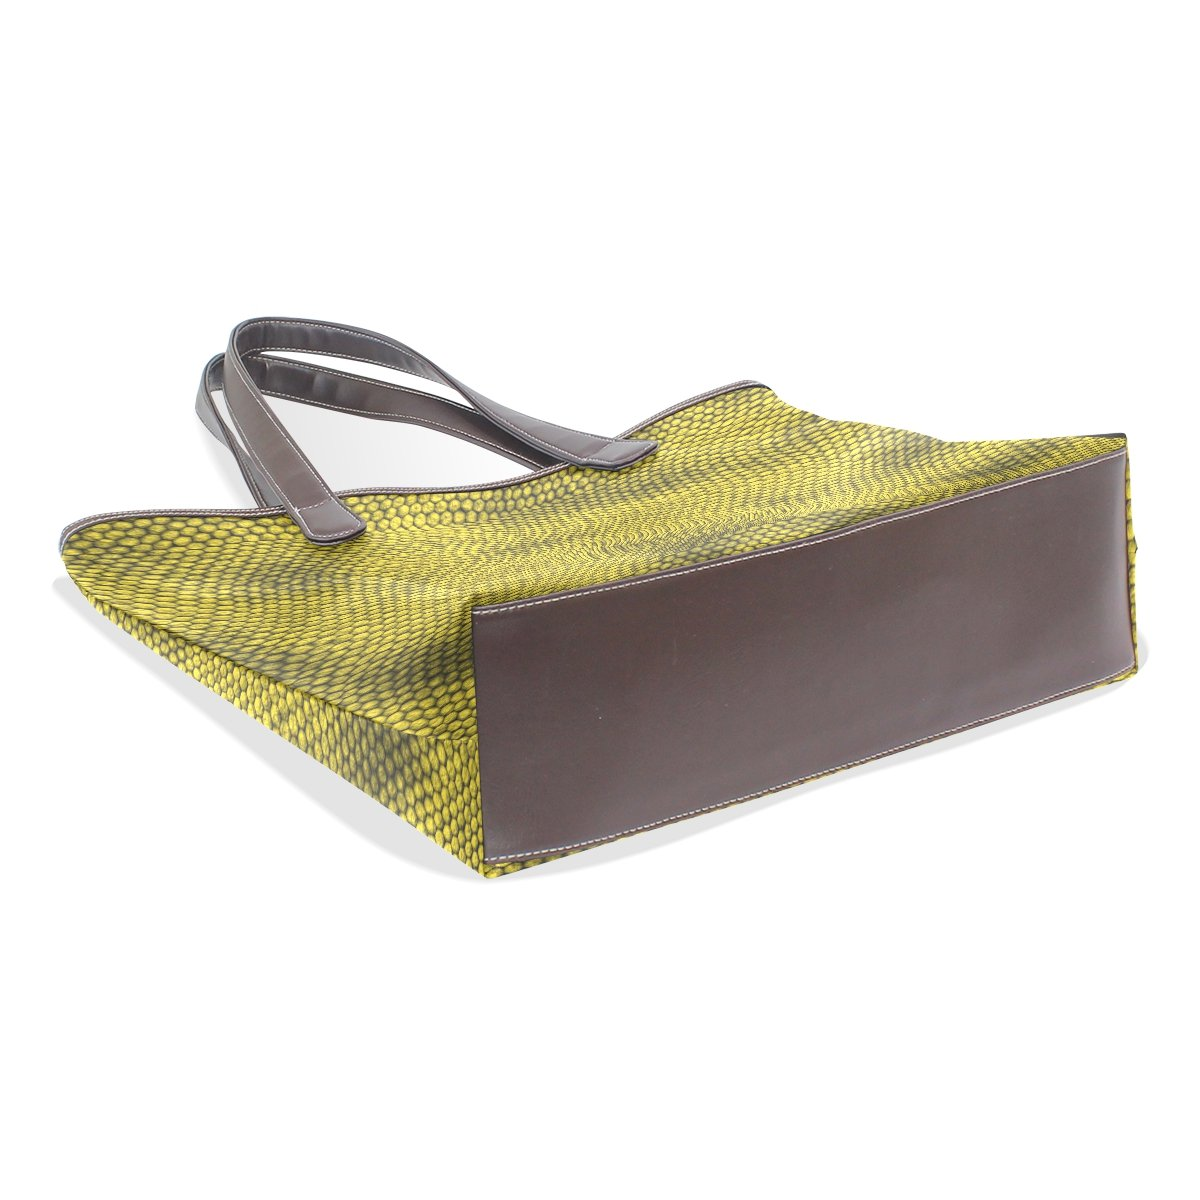 SCDS Green Texture PU Leather Lady Handbag Tote Bag Zipper Shoulder Bag